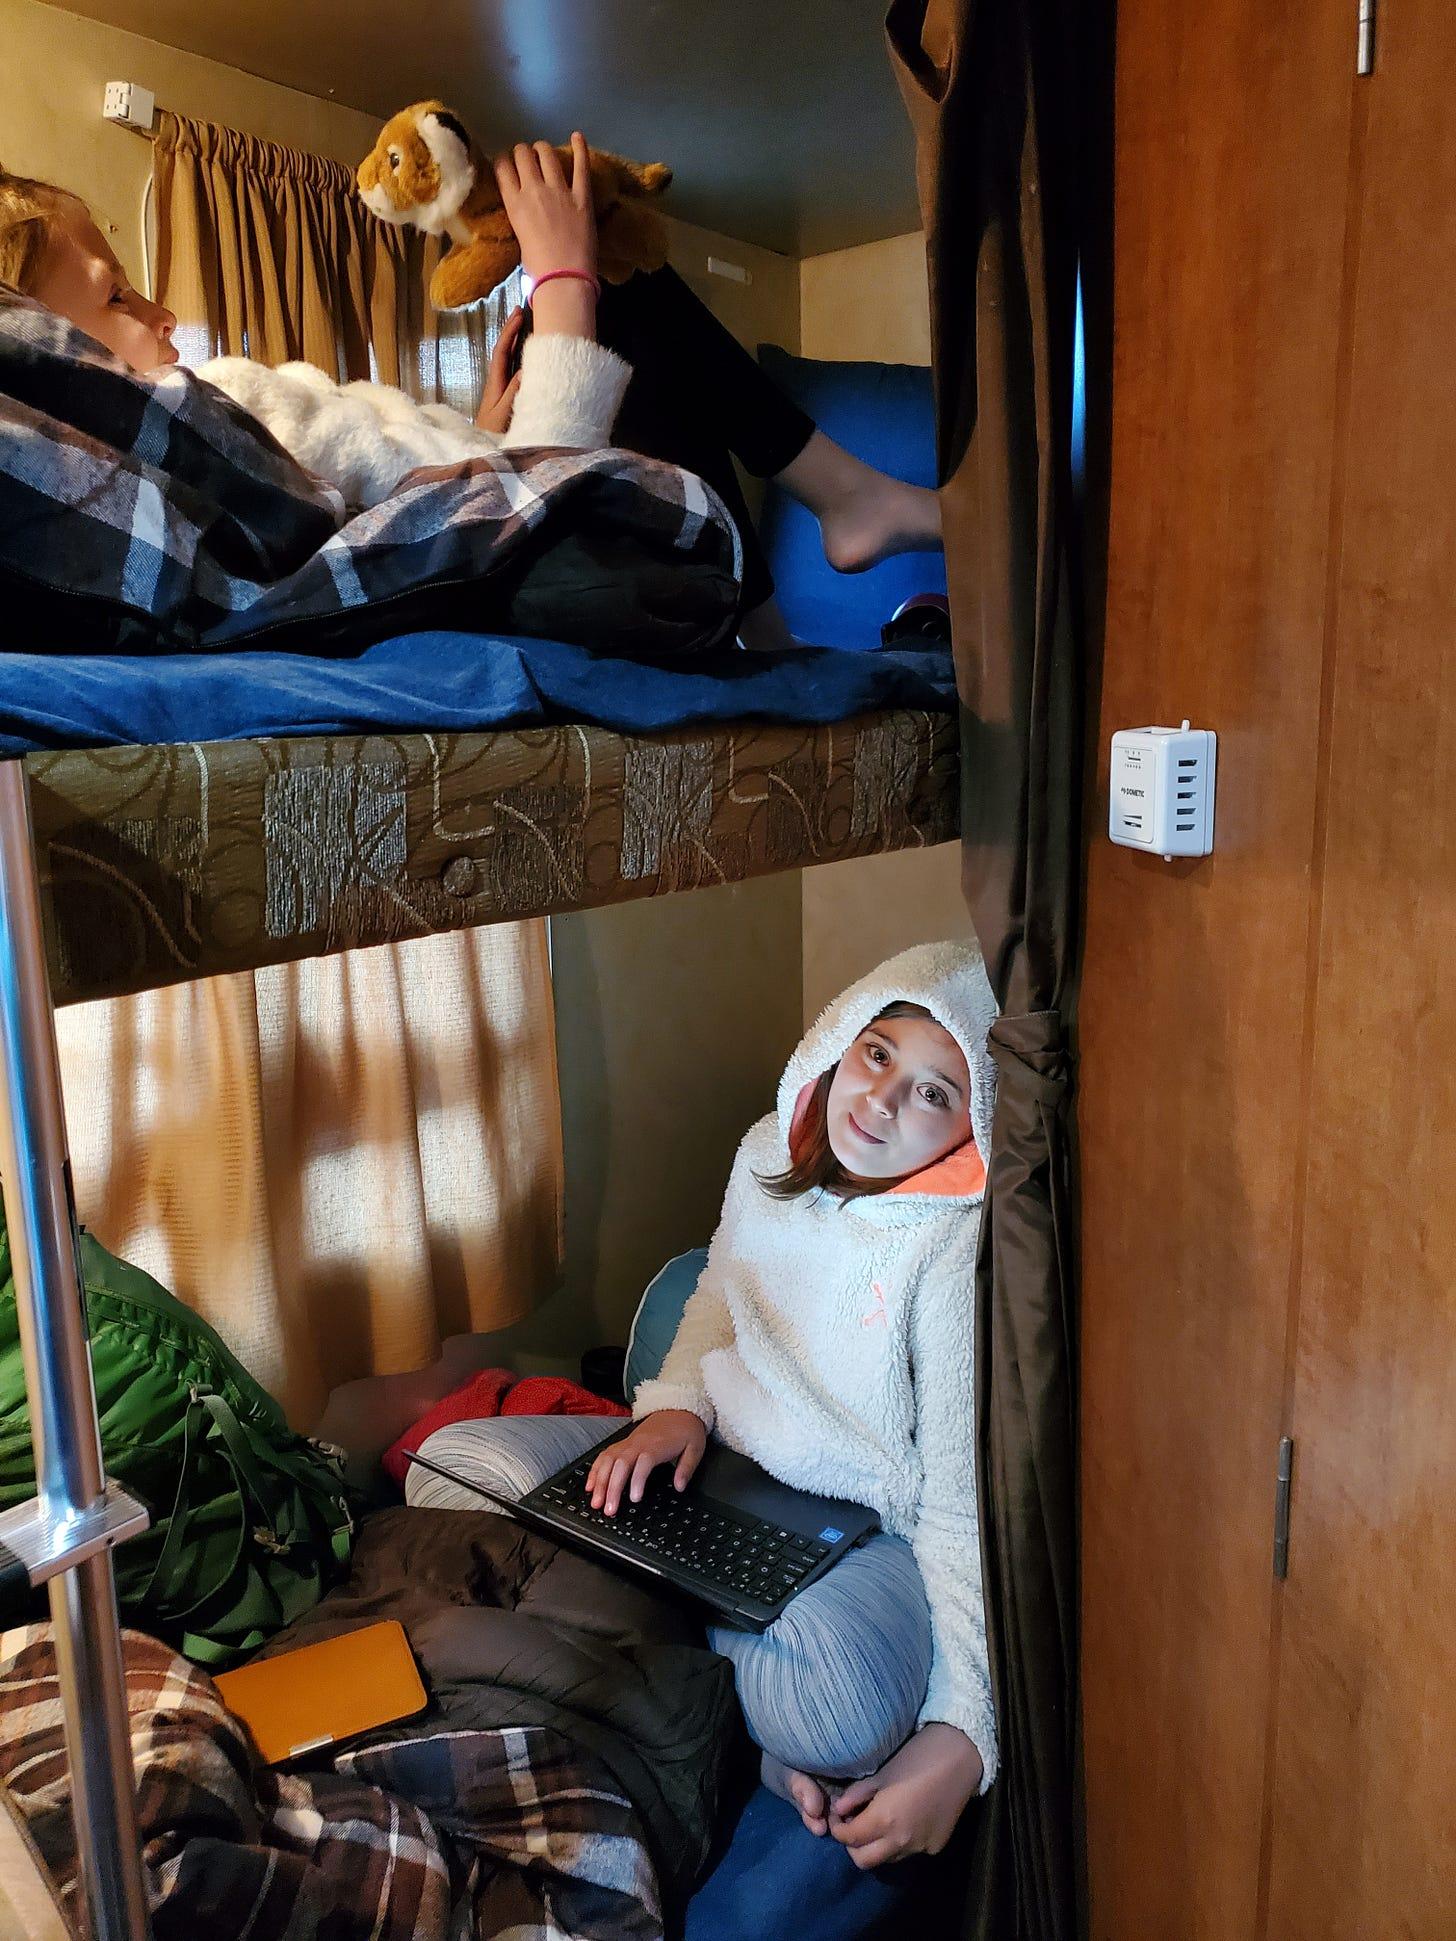 Interior shot of the travel trailer. One girl in the upper bunk and one girl in the lower bunk bed.